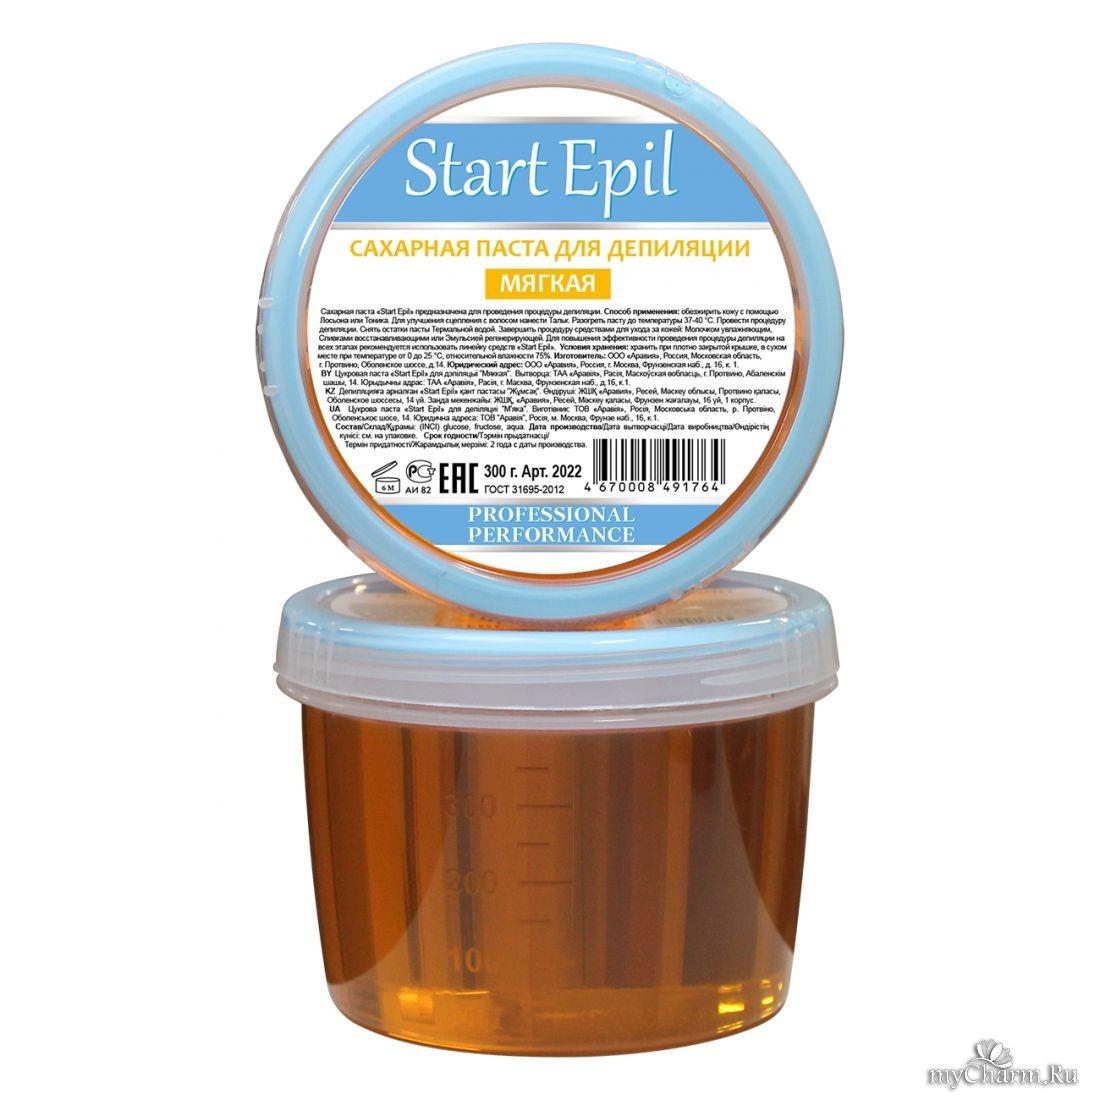 паста start epil отзывы